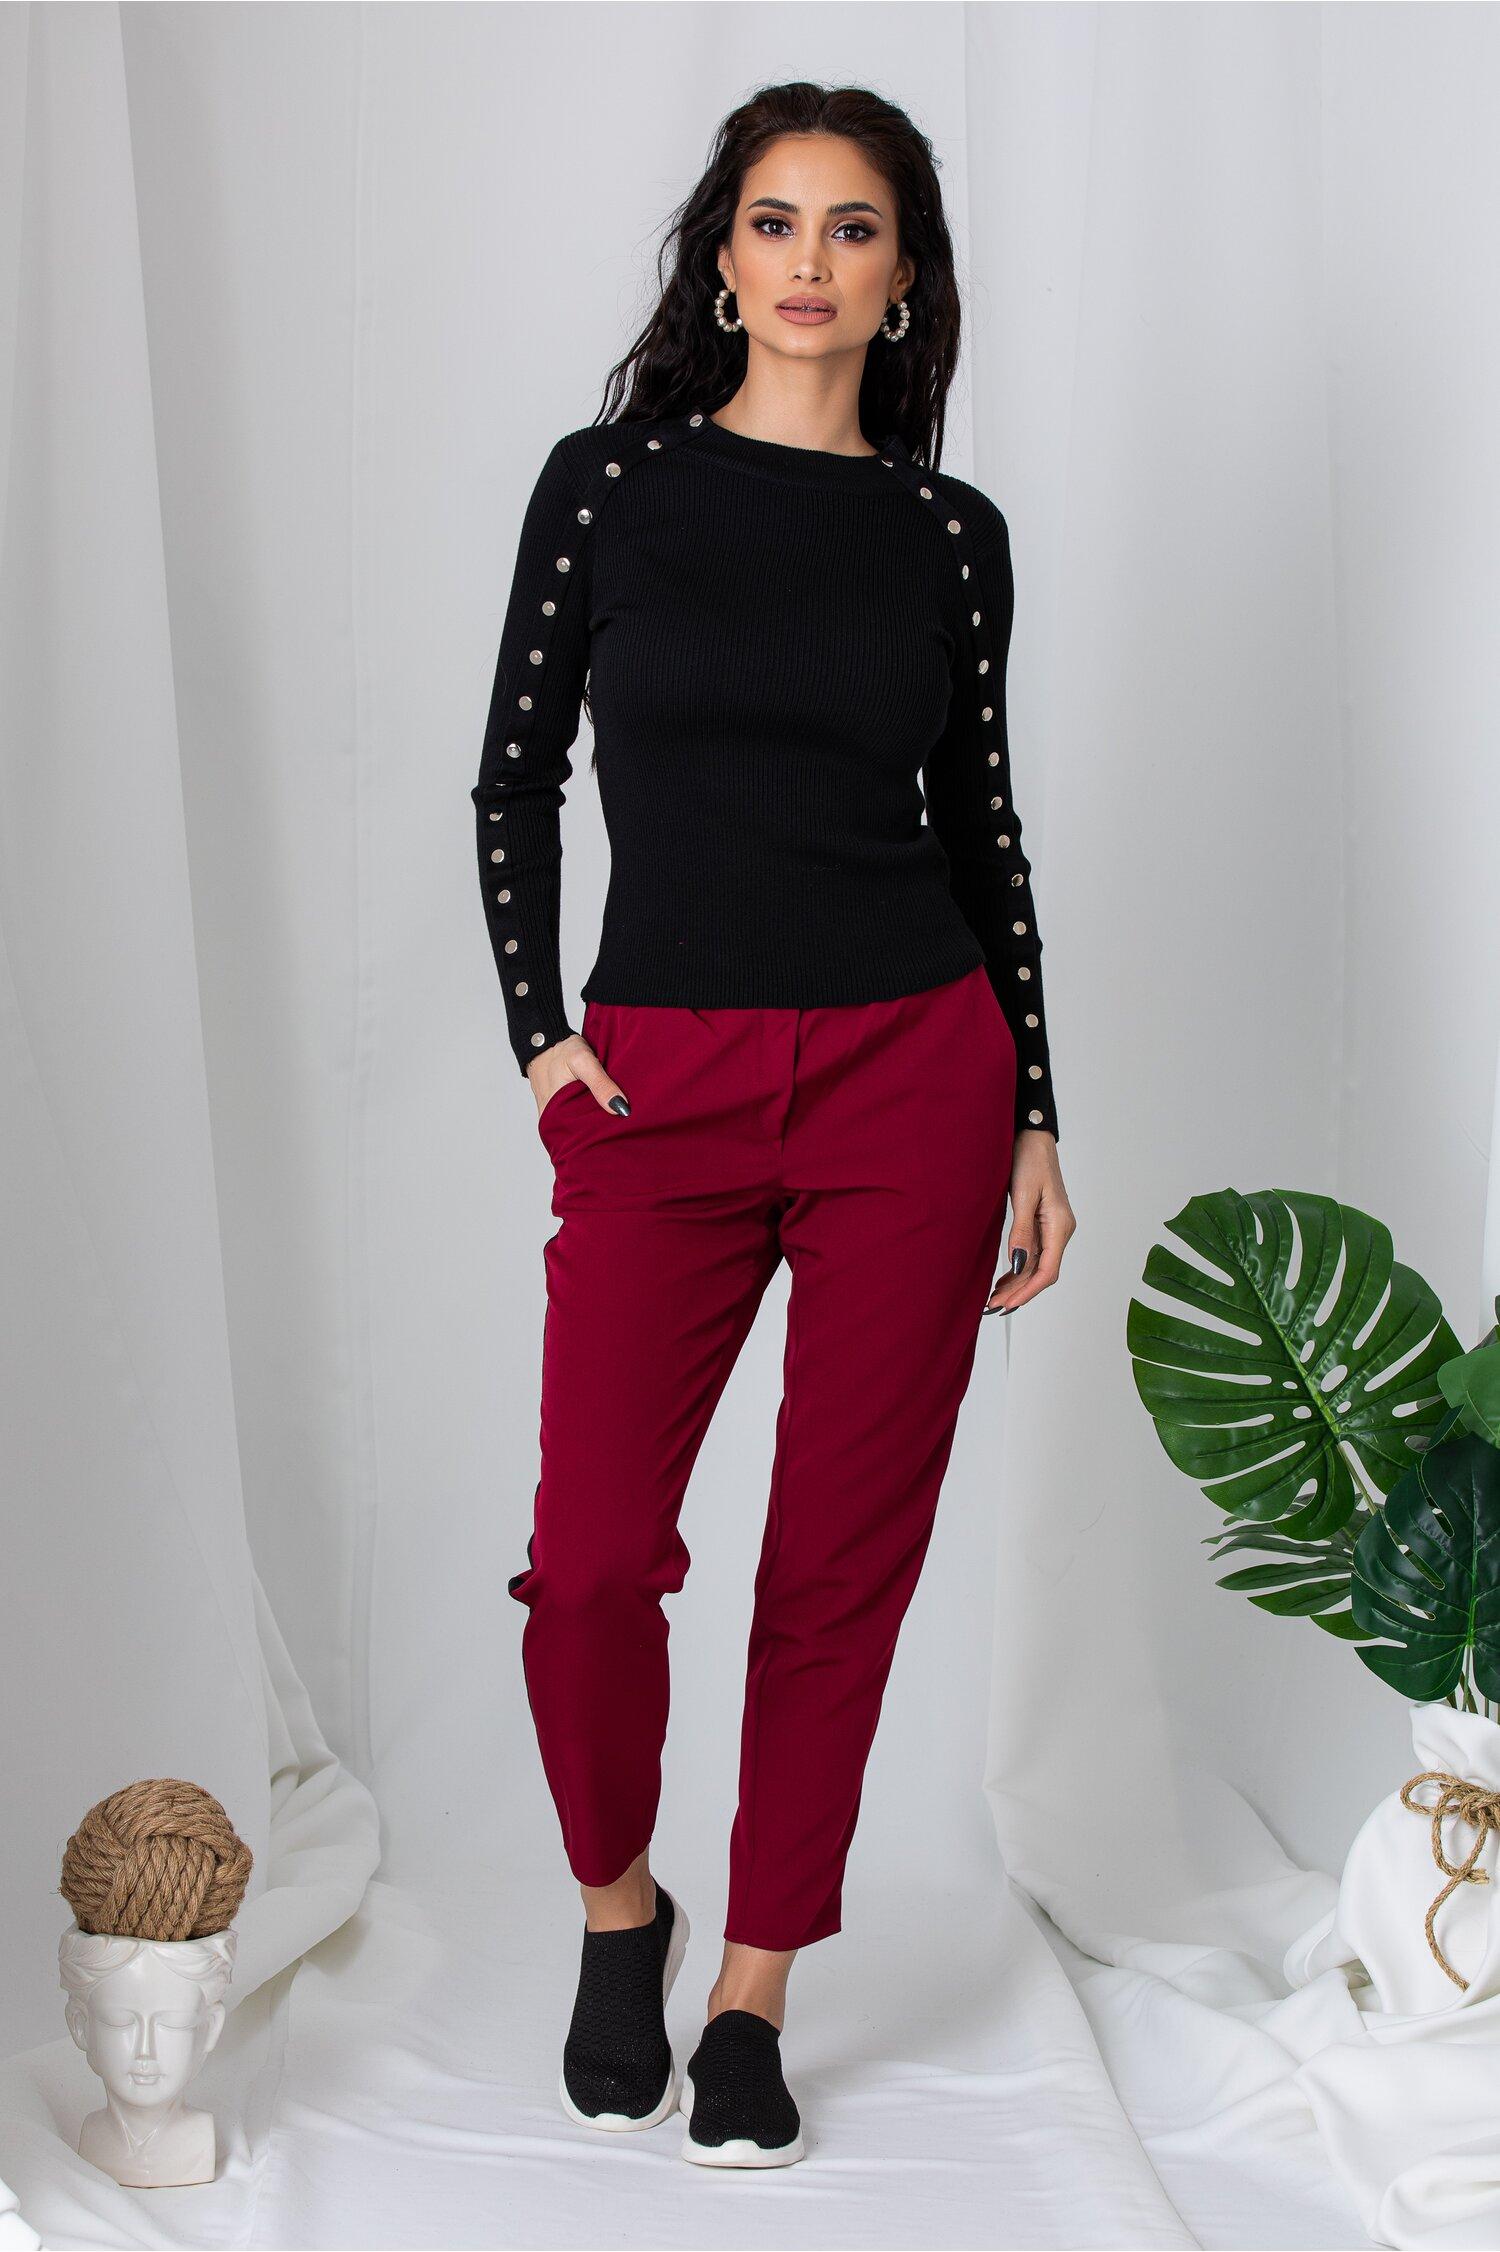 Pantaloni bordo cu elastic in talie si lampas negru din catifea